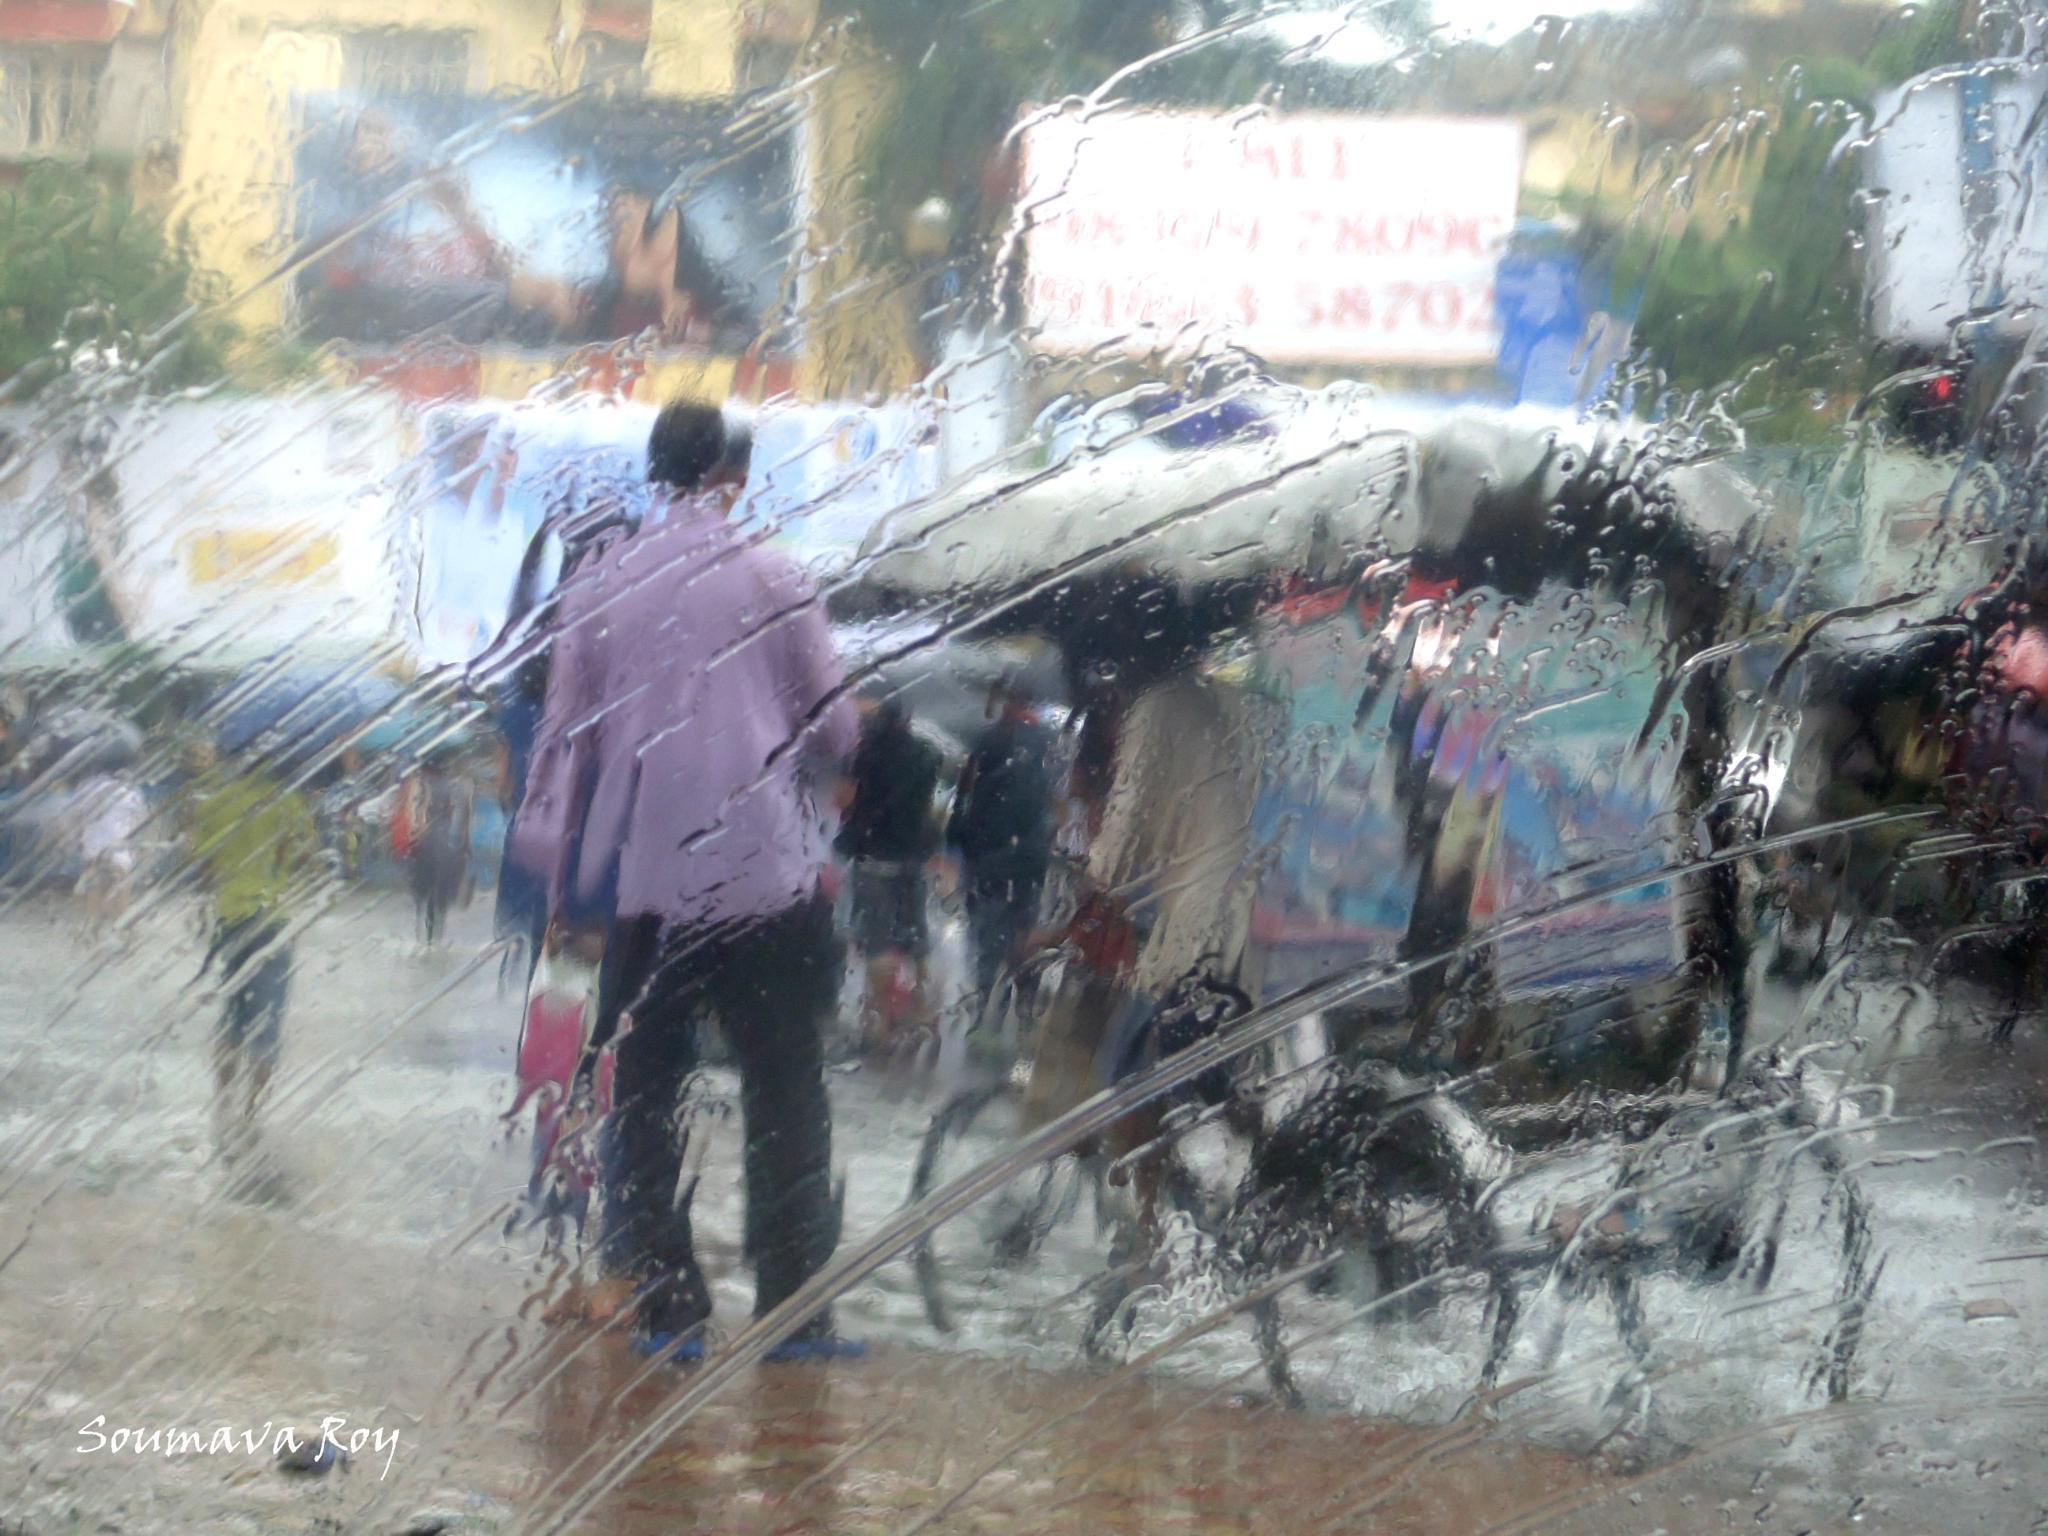 Rain Canvas 1 by soumavaroy56